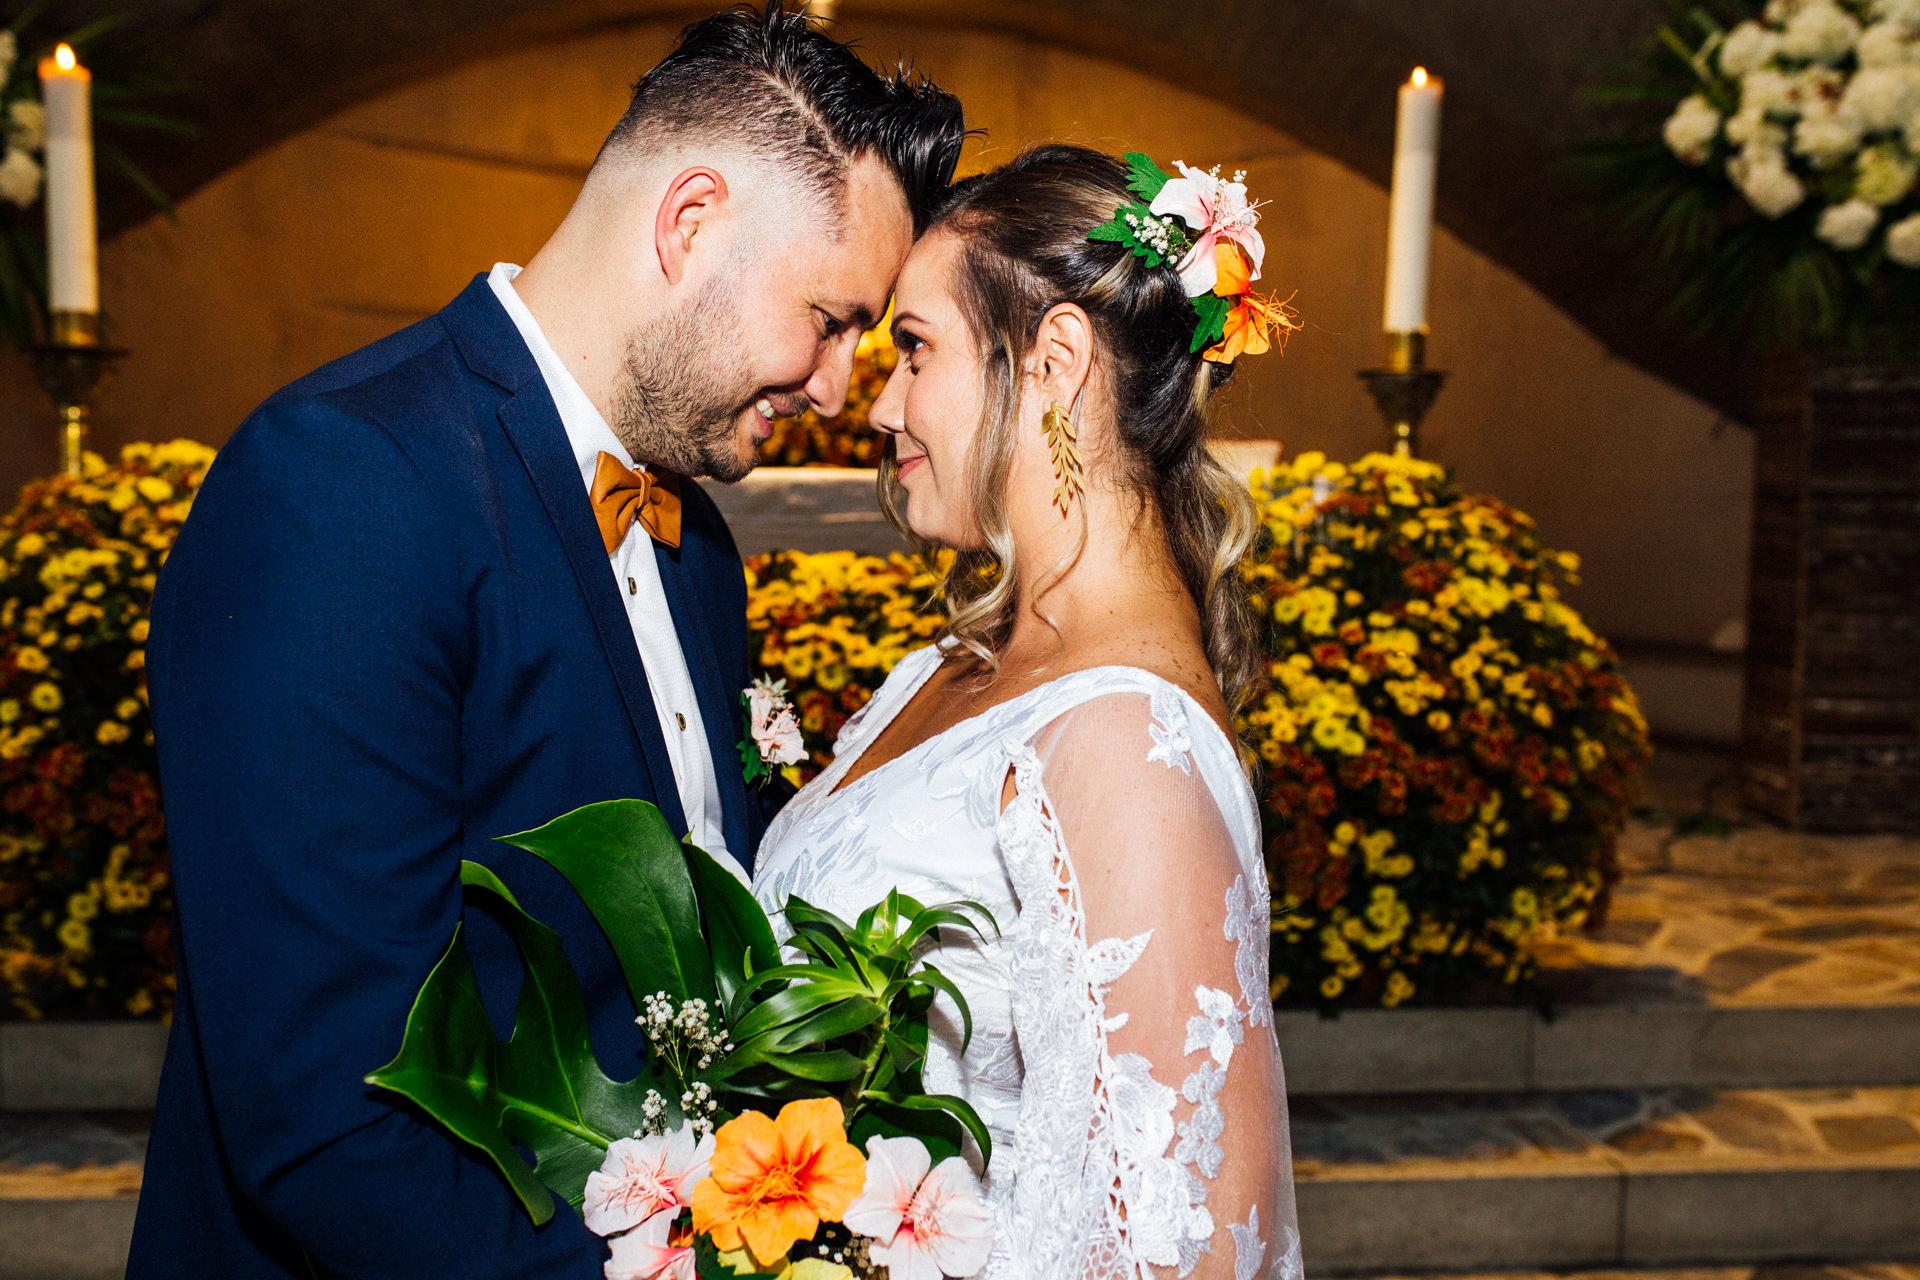 Wedding-Boda-Matrimonio-Fotografo-Fotografia-bodas-Medellin-Llanogrande-Colombia-Bogota-Cartagena-Miami-Wed-Destination-Photojournalism (130).JPG